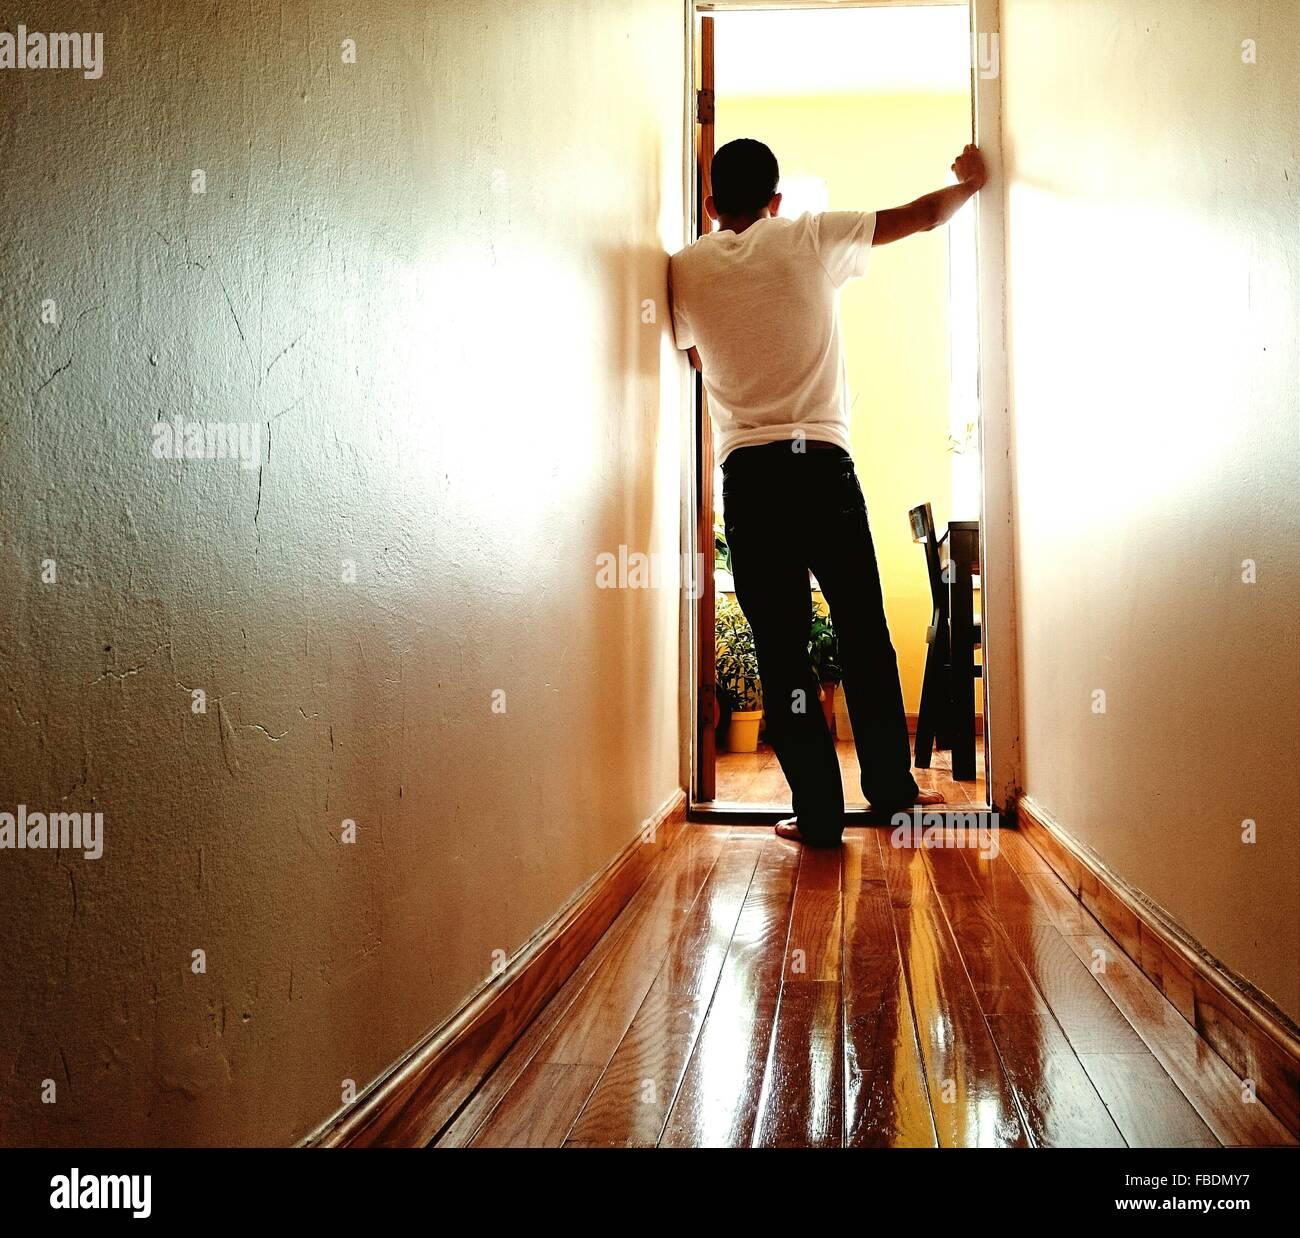 Man Standing At Doorway - Stock Image